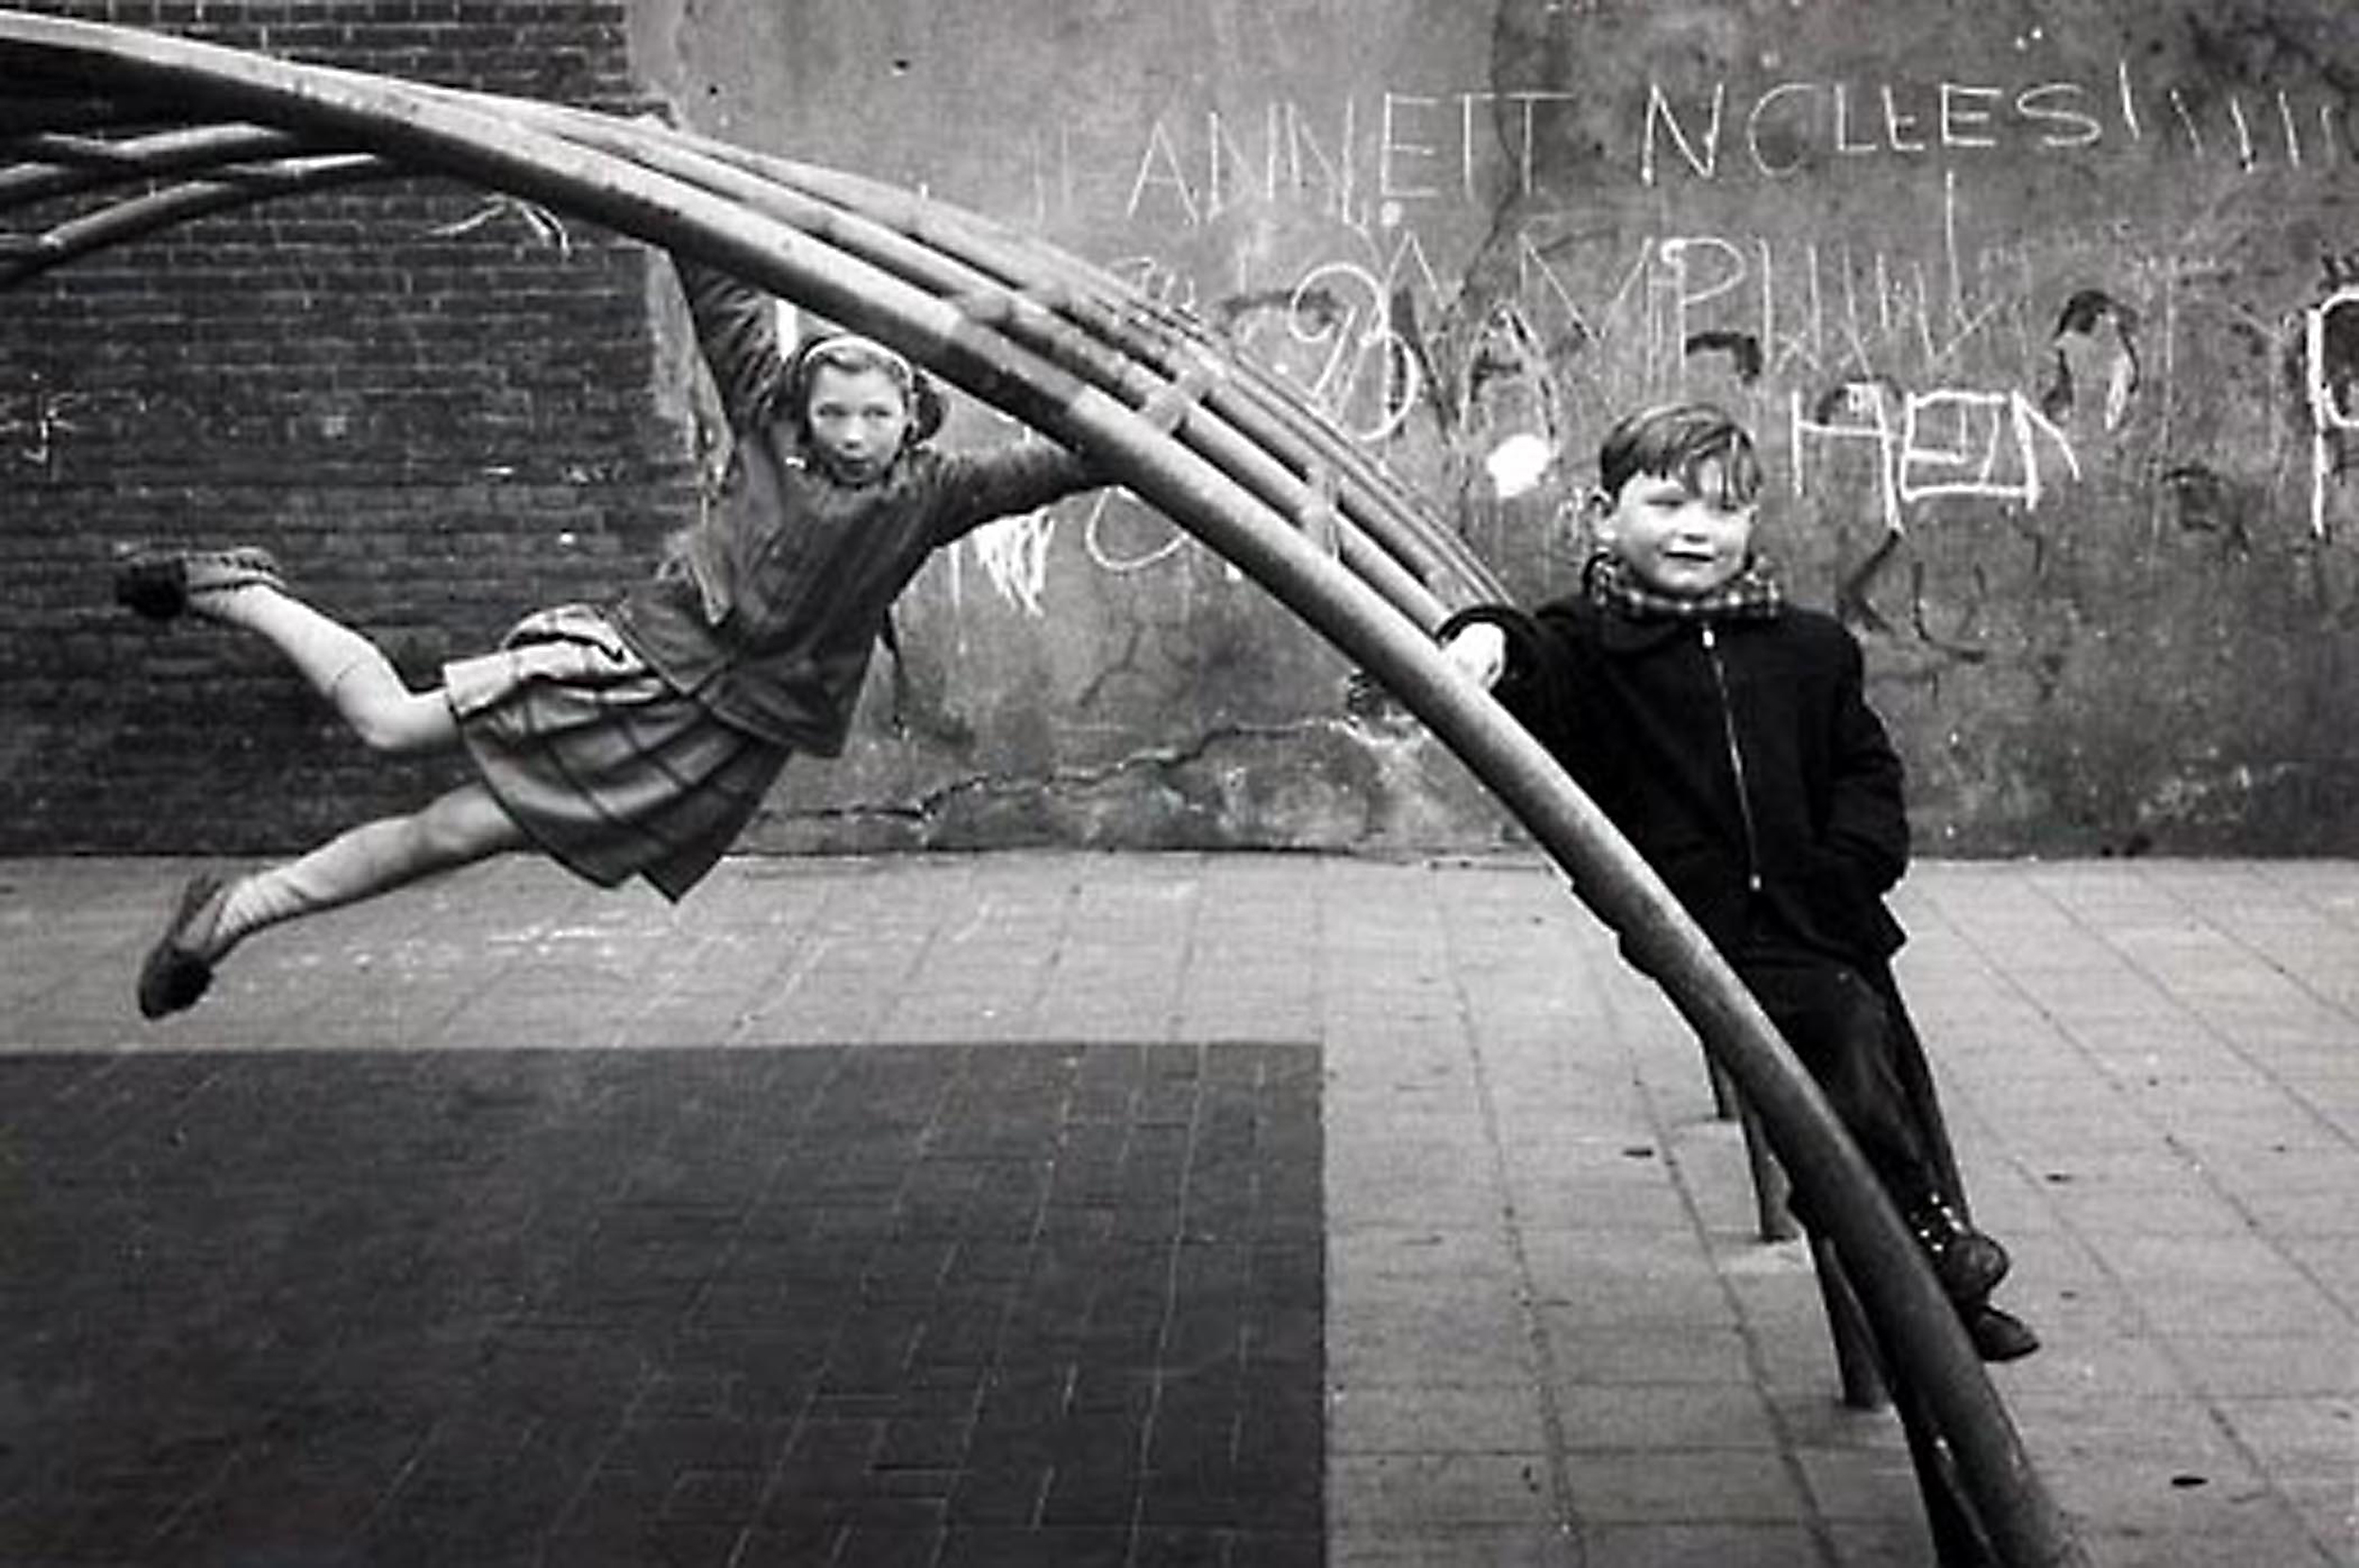 HANNON_monkey_bars_amsterdam_1956_11x14_high.jpg